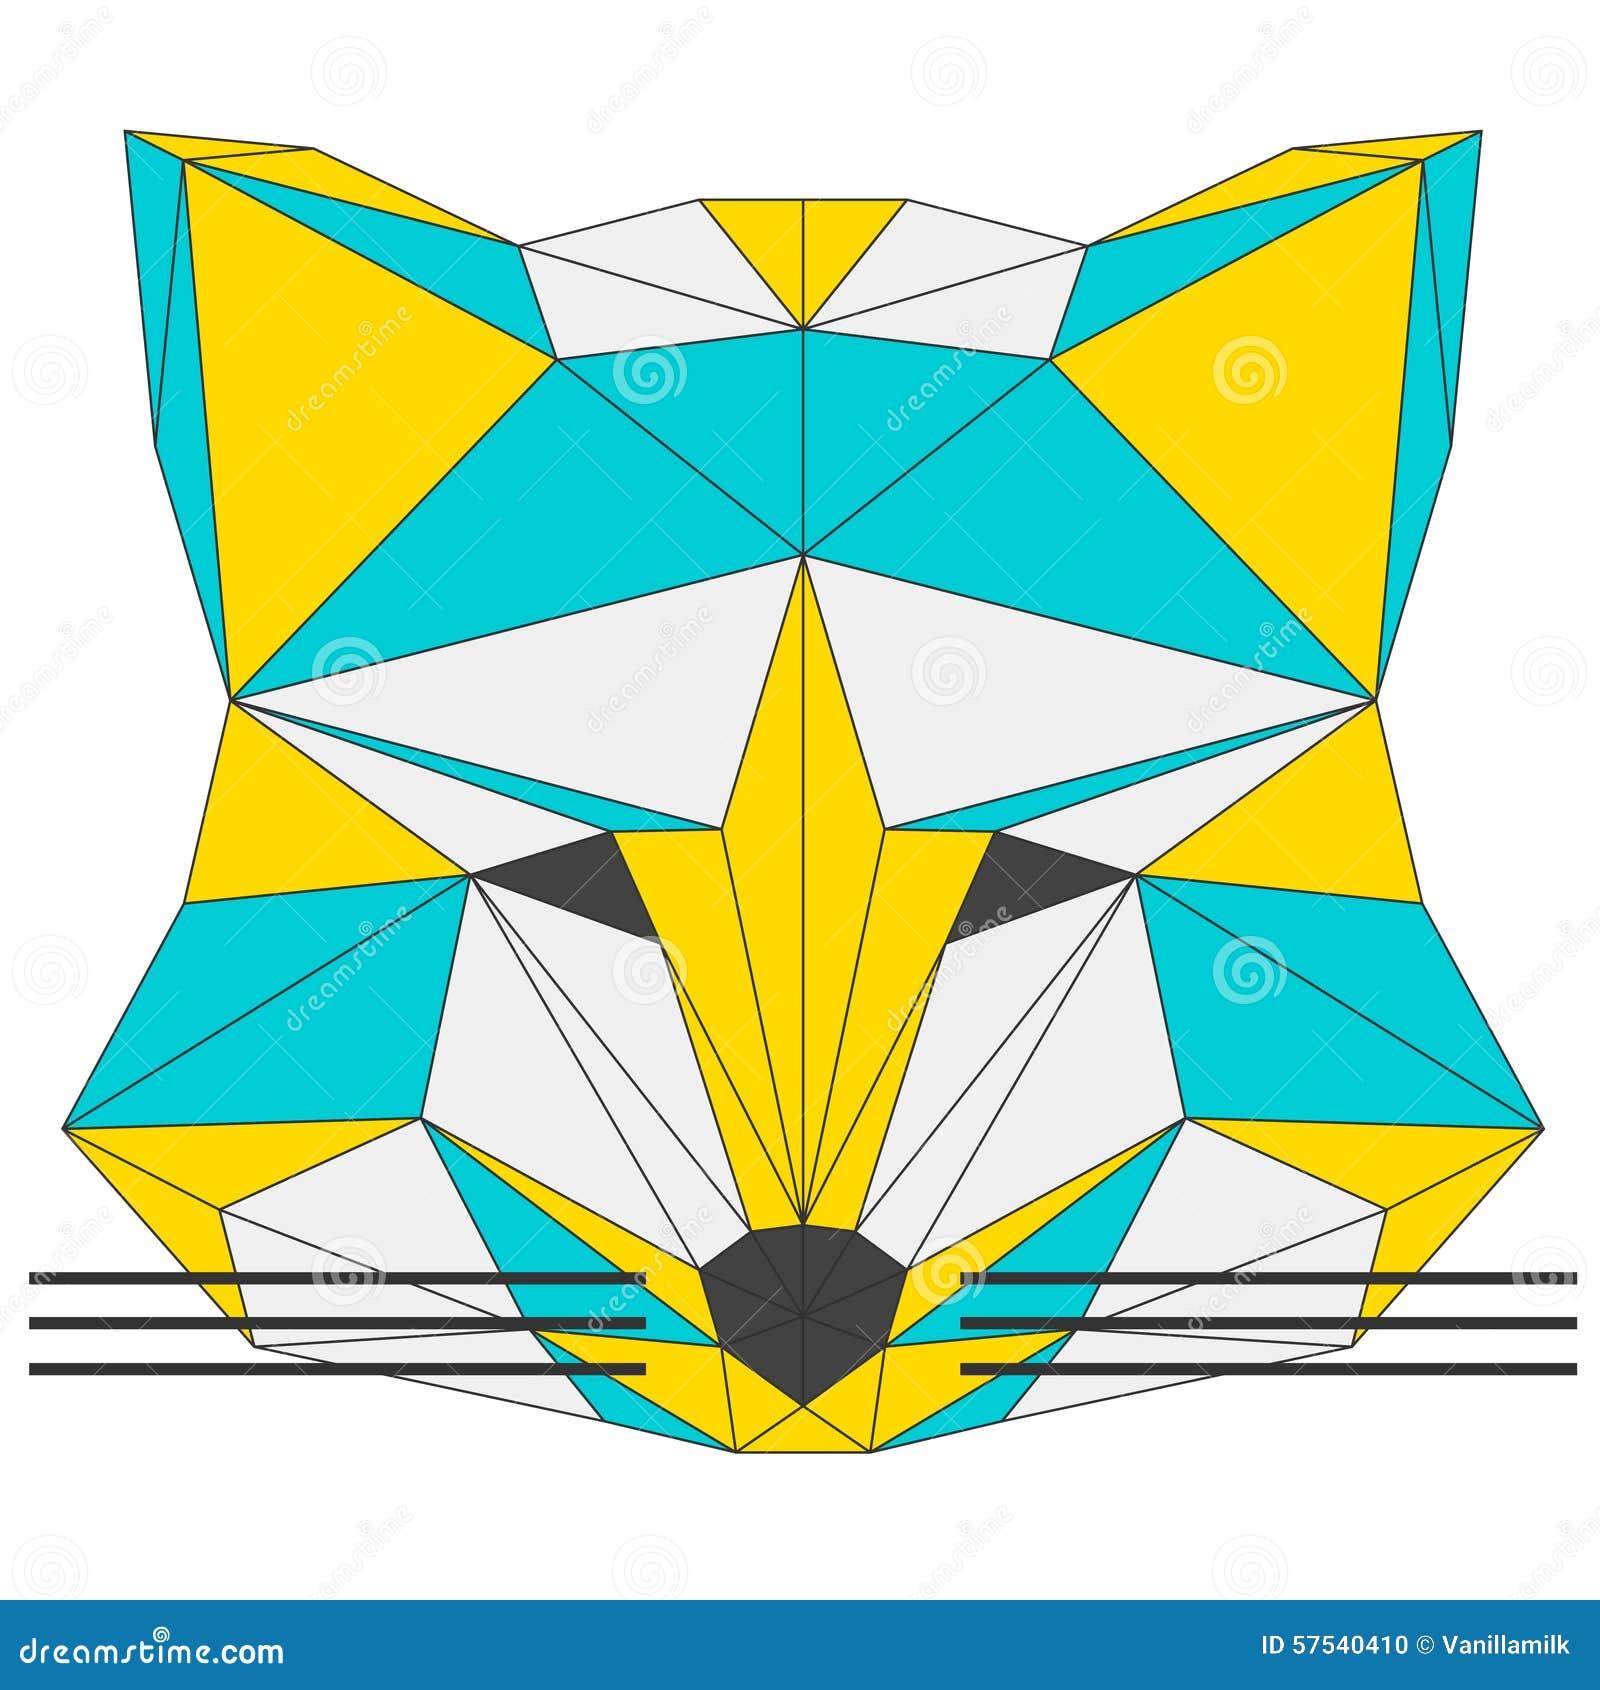 geometric yellow background illustration - photo #18